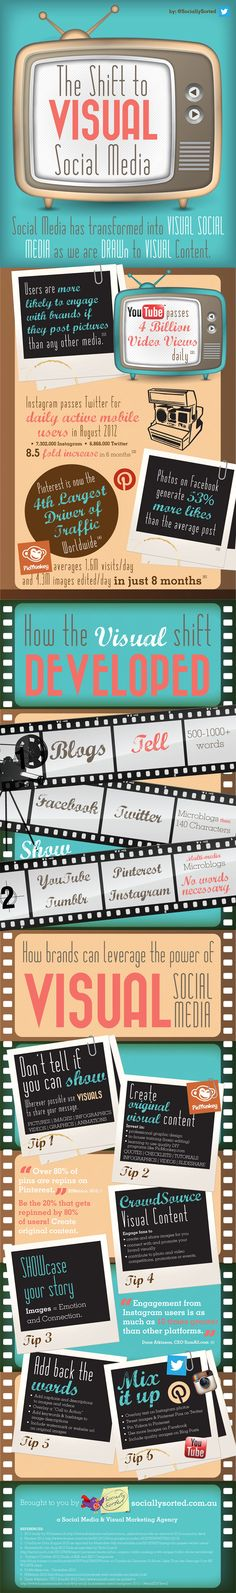 The Shift to Visual Social Media | #socialmedia #Infographic